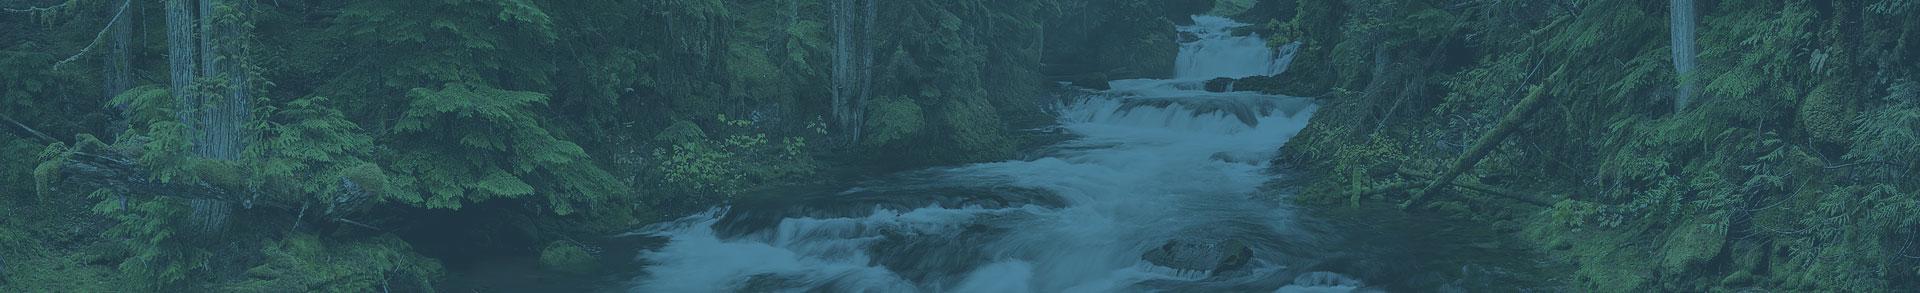 oregon waters